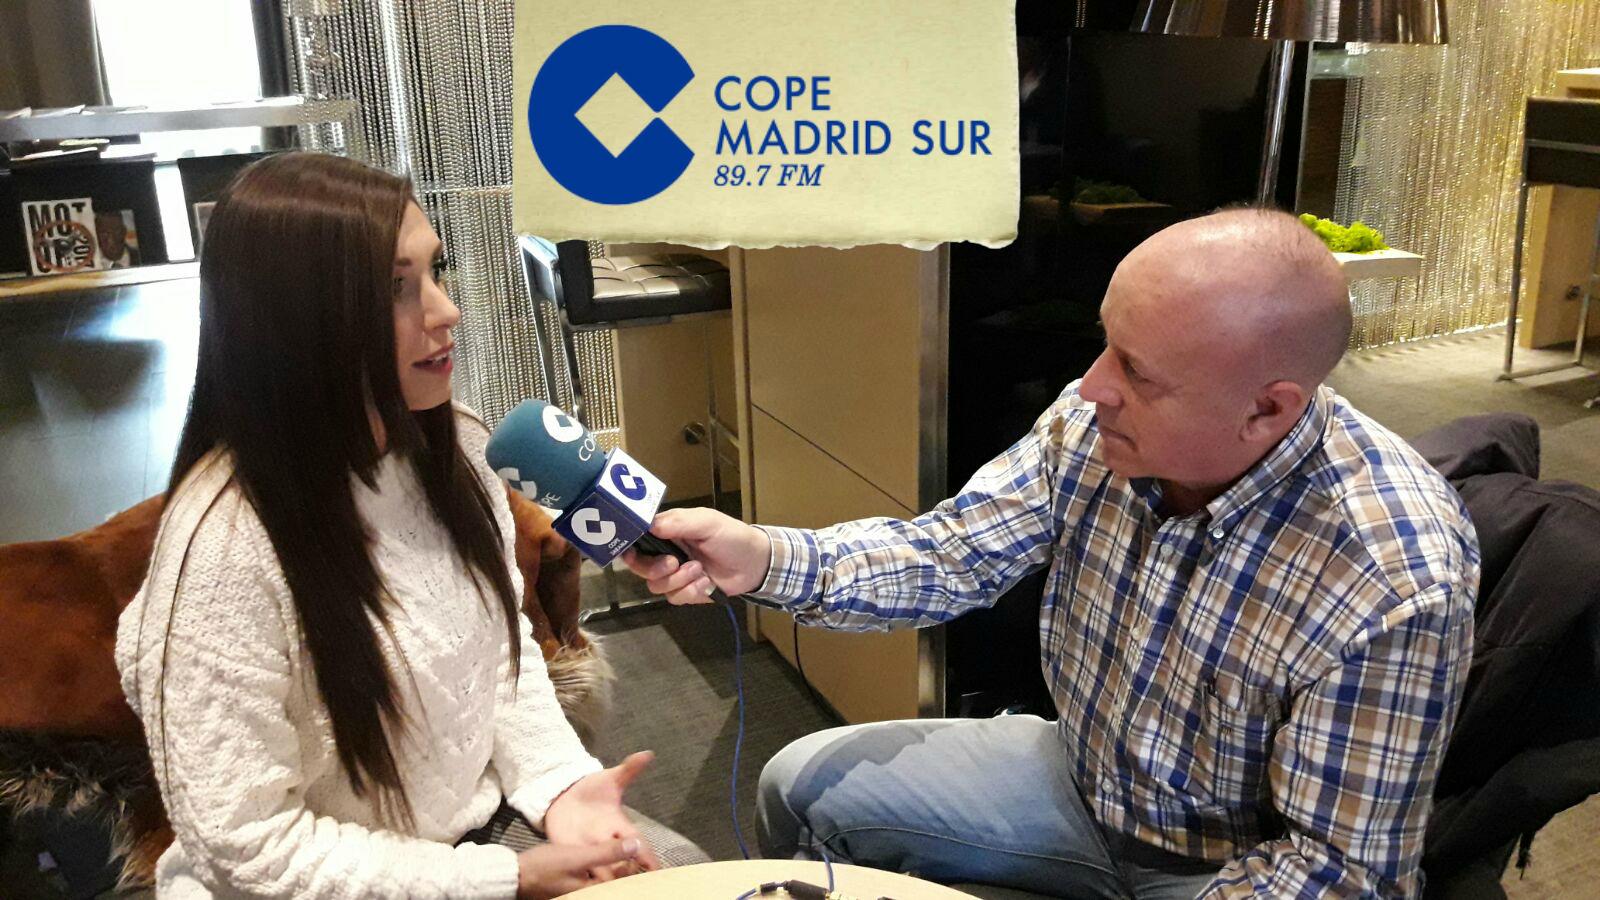 Entrevista a Maricarmen Molina en Cope Madrid con Rafael Vega